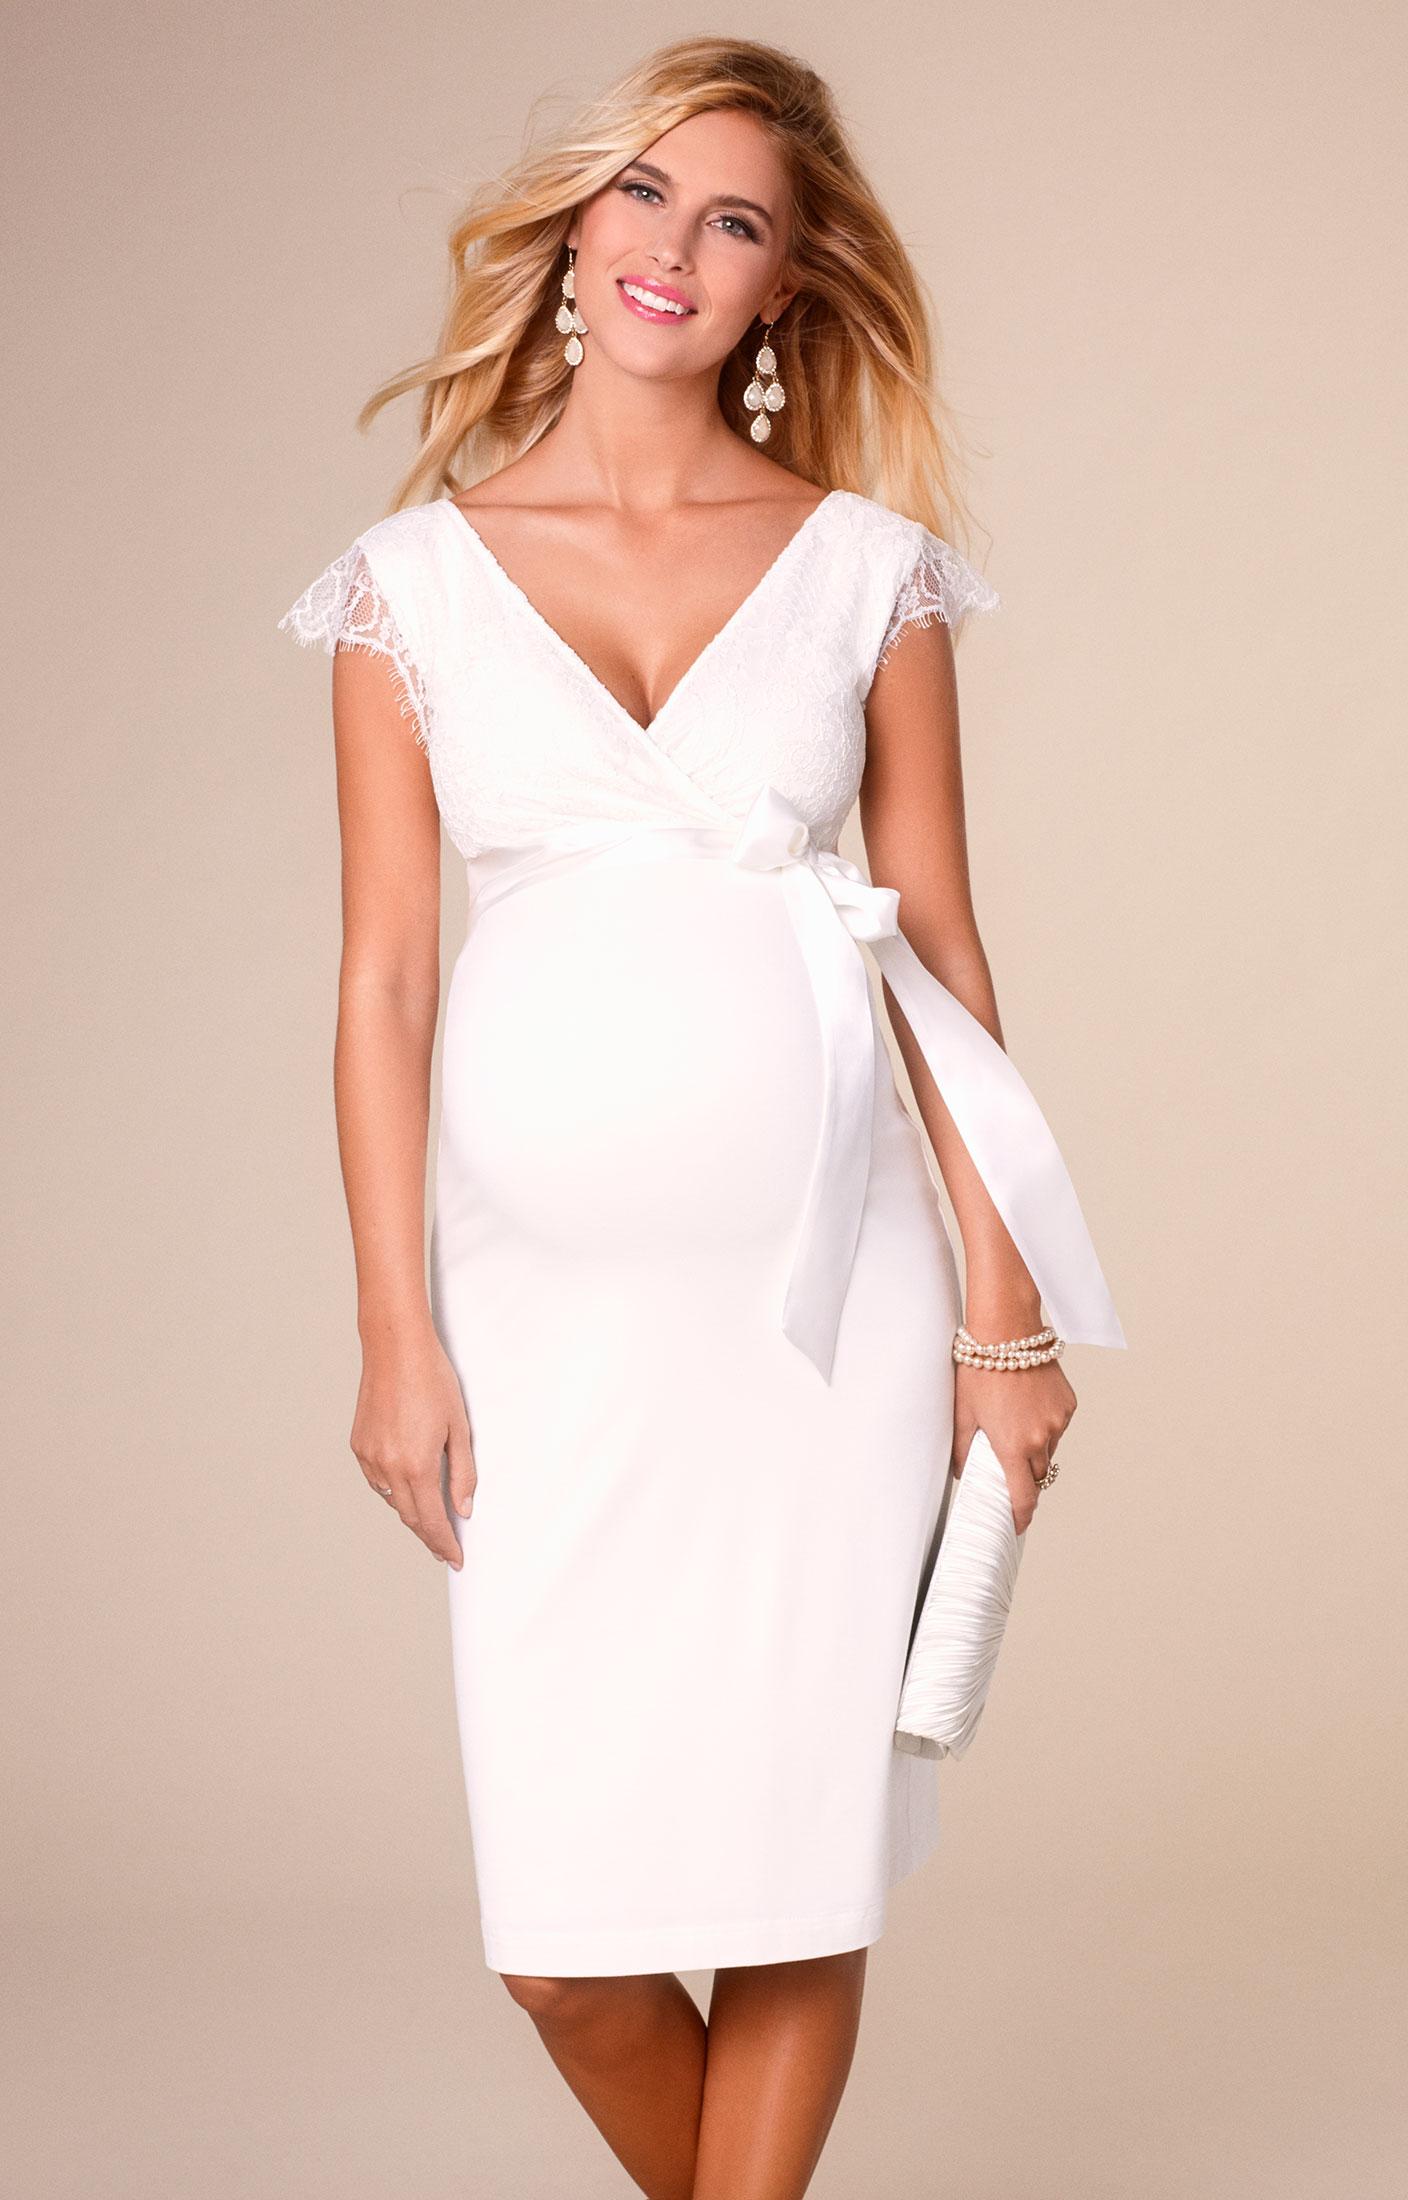 Maternity wedding dresses maternity wedding gowns and maternity rosa maternity wedding dress ivory ombrellifo Image collections